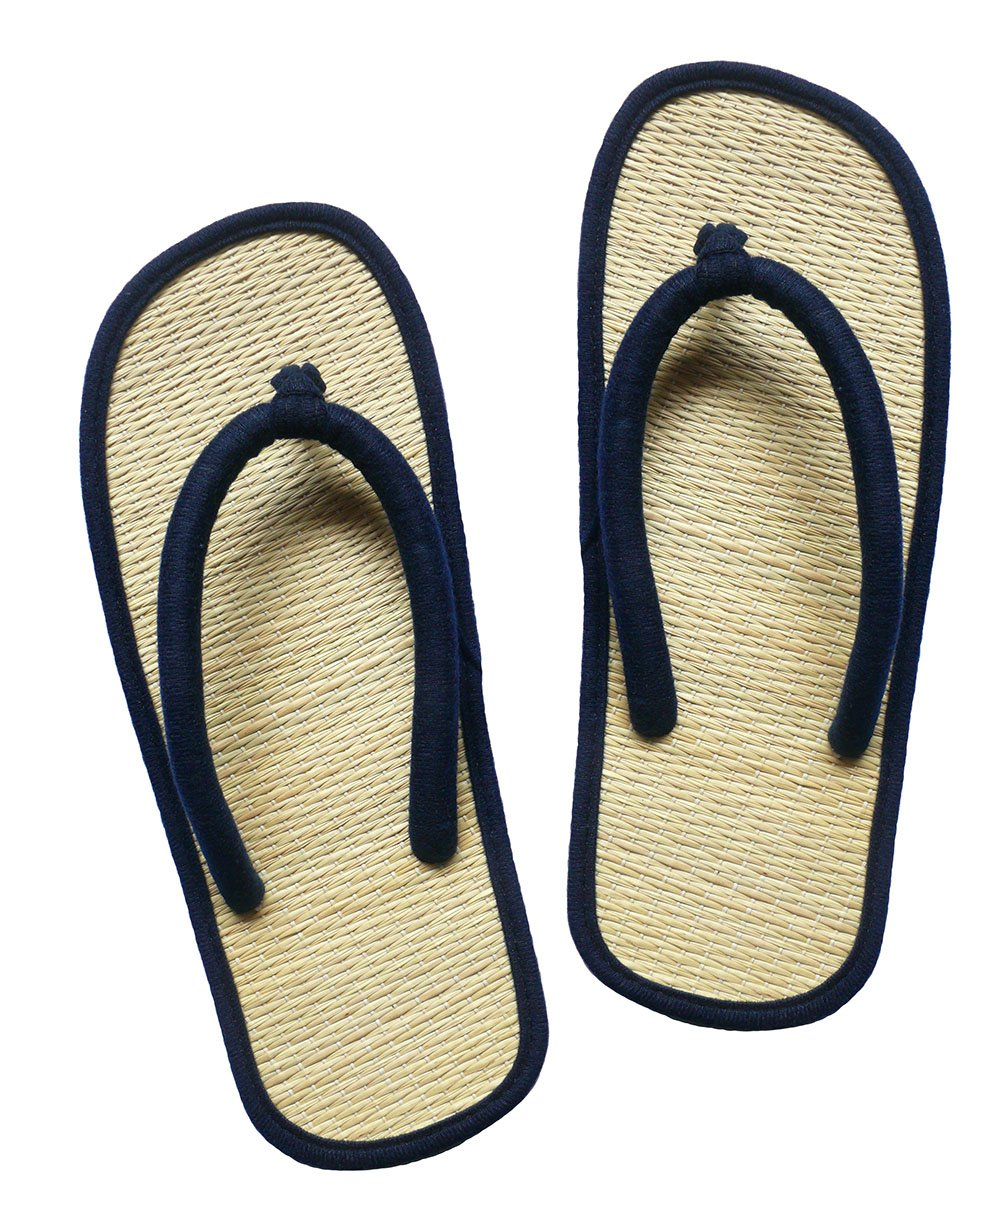 USA STEP Women's Big Girls' Handmade Fashion Indoor Outdoor Home Spa Hotel Solid Dark Blue Straw Seagrass Summer Flip Flops Sandals Slippers Thong